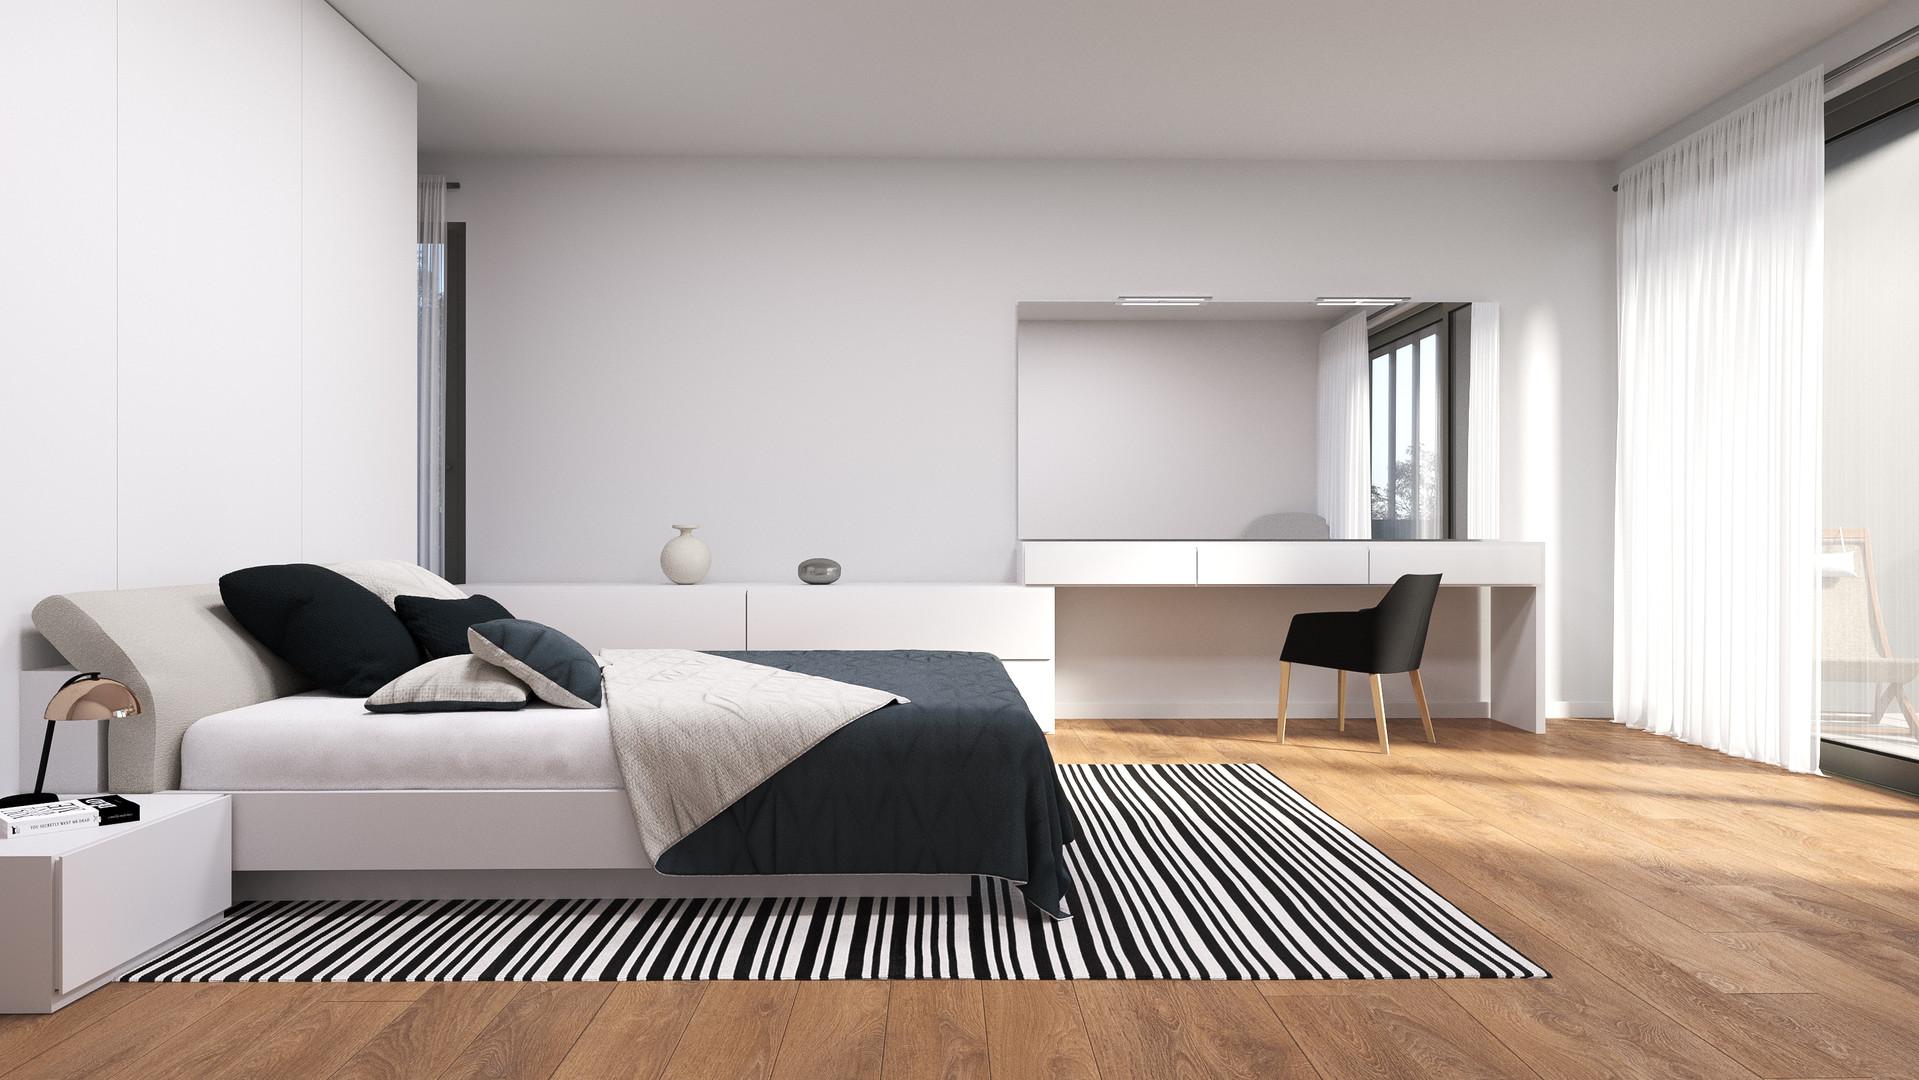 P18-4 dormitorio_Final-42_edited.jpg